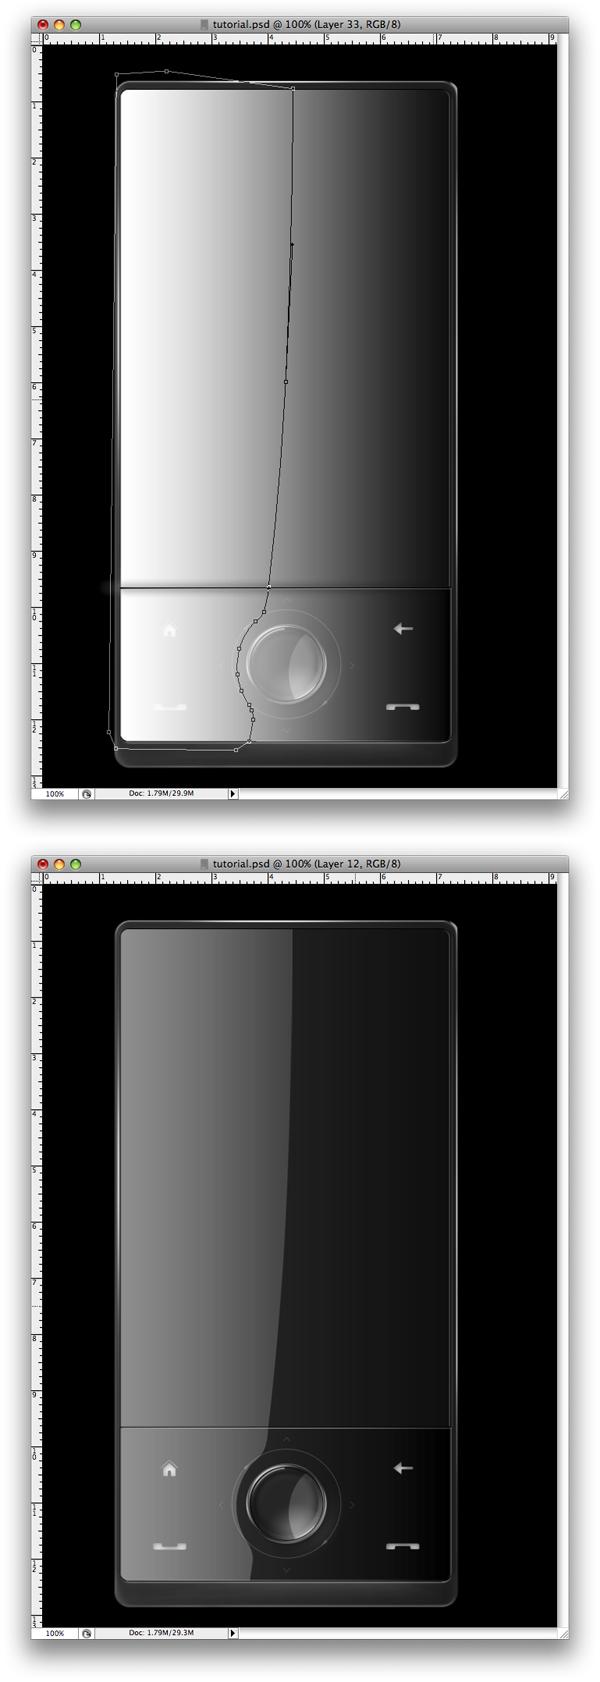 [Tutorial] Celular HTC Touch Diamond 33